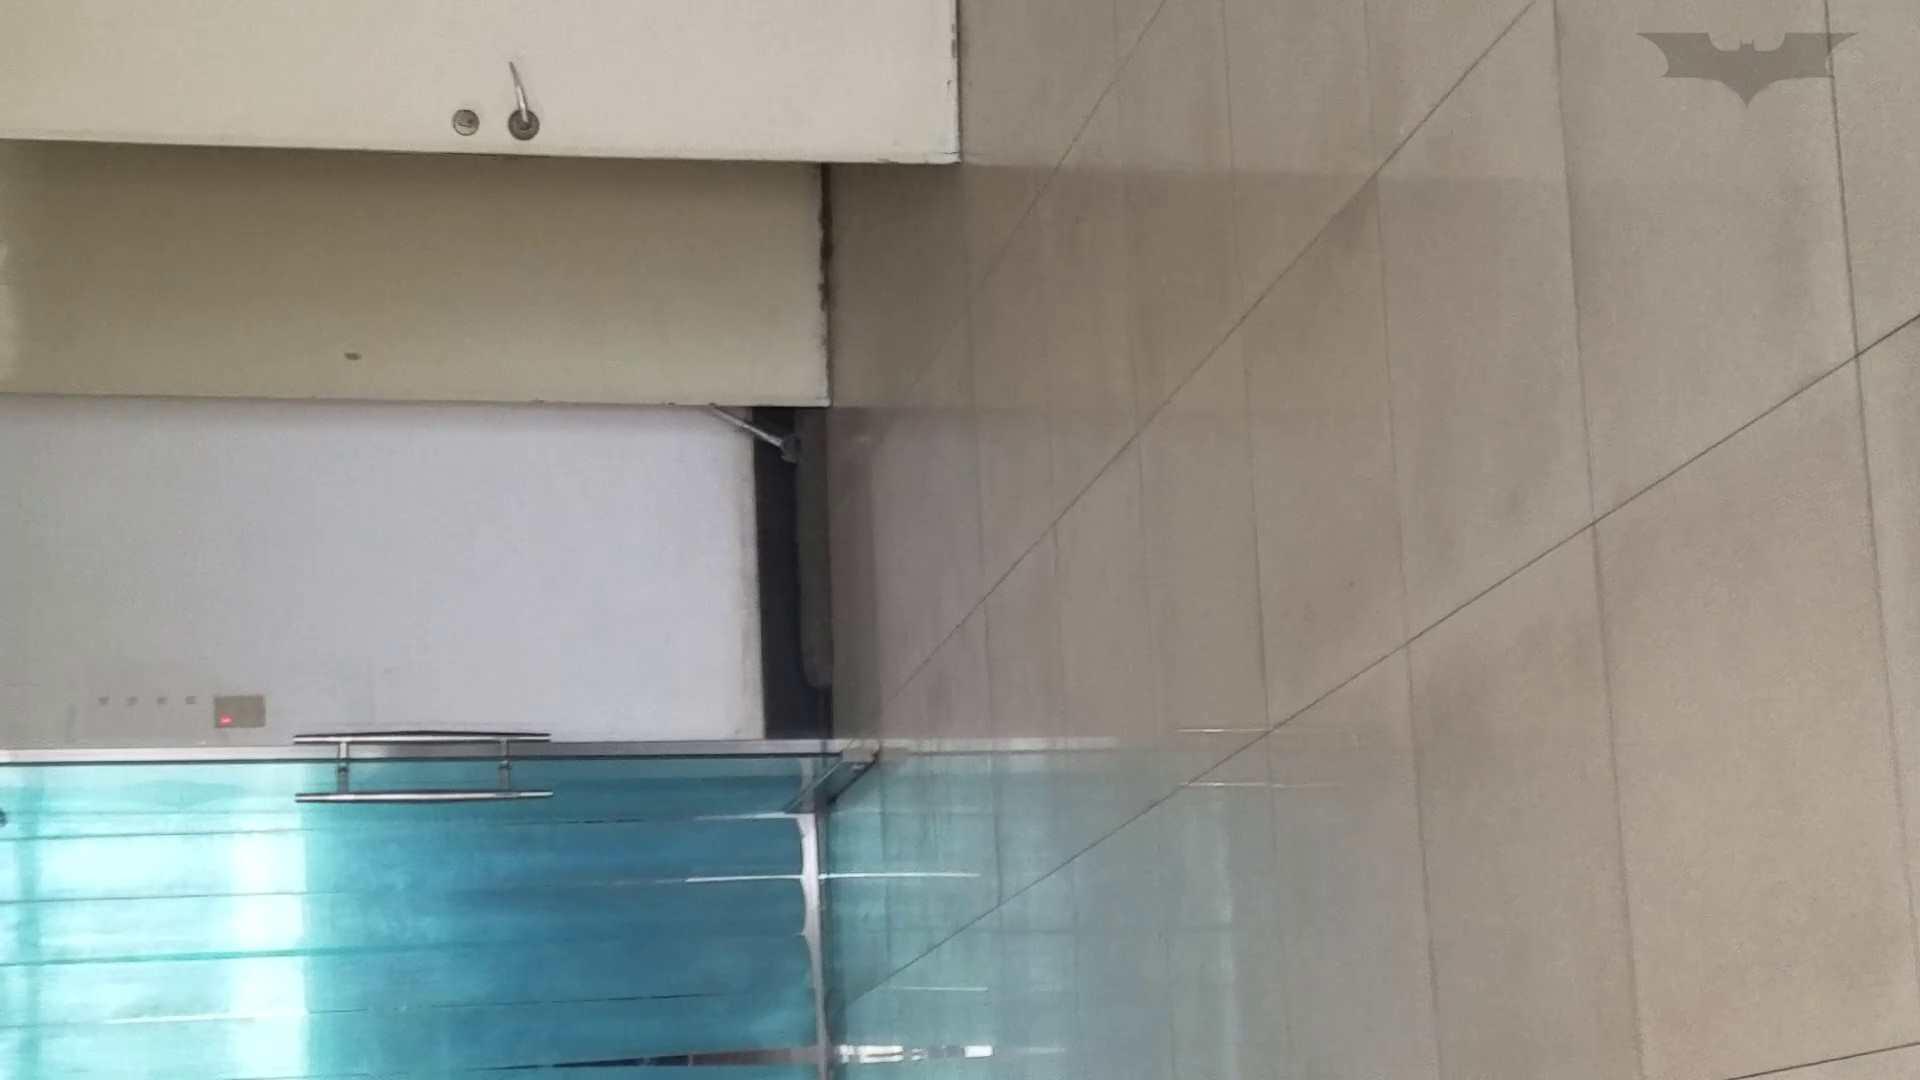 JD盗撮 美女の洗面所の秘密 Vol.70 洗面所 セックス無修正動画無料 111枚 102